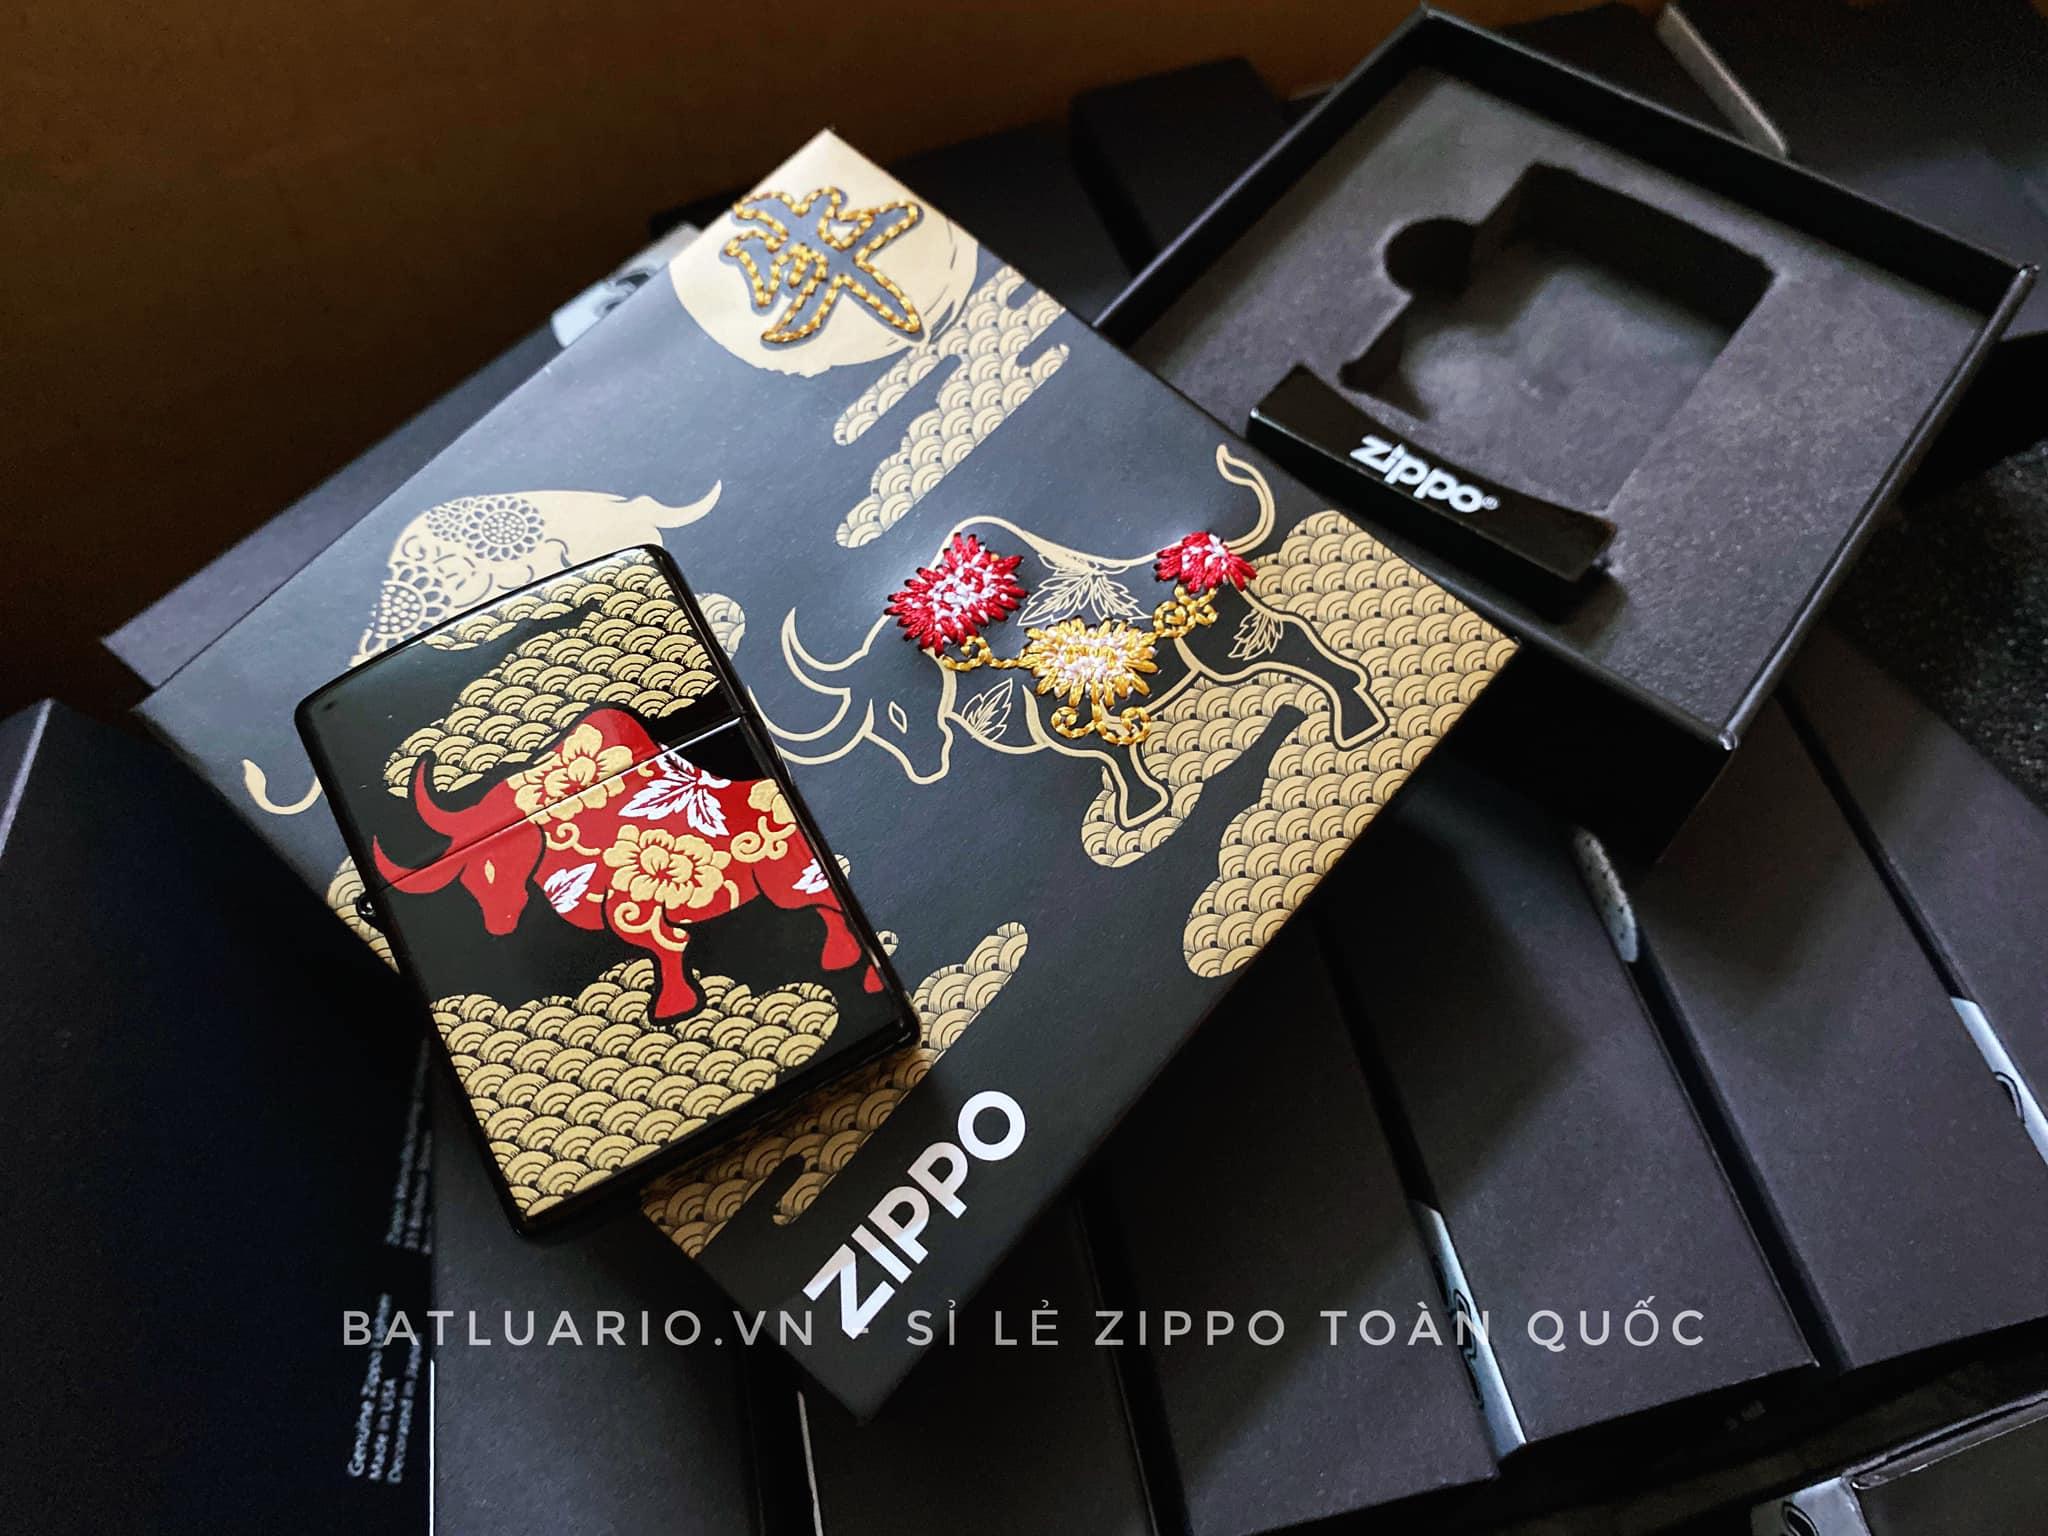 Zippo Year Of The Ox Black Asia Limited Edition - Zippo CZA-2-18B 10